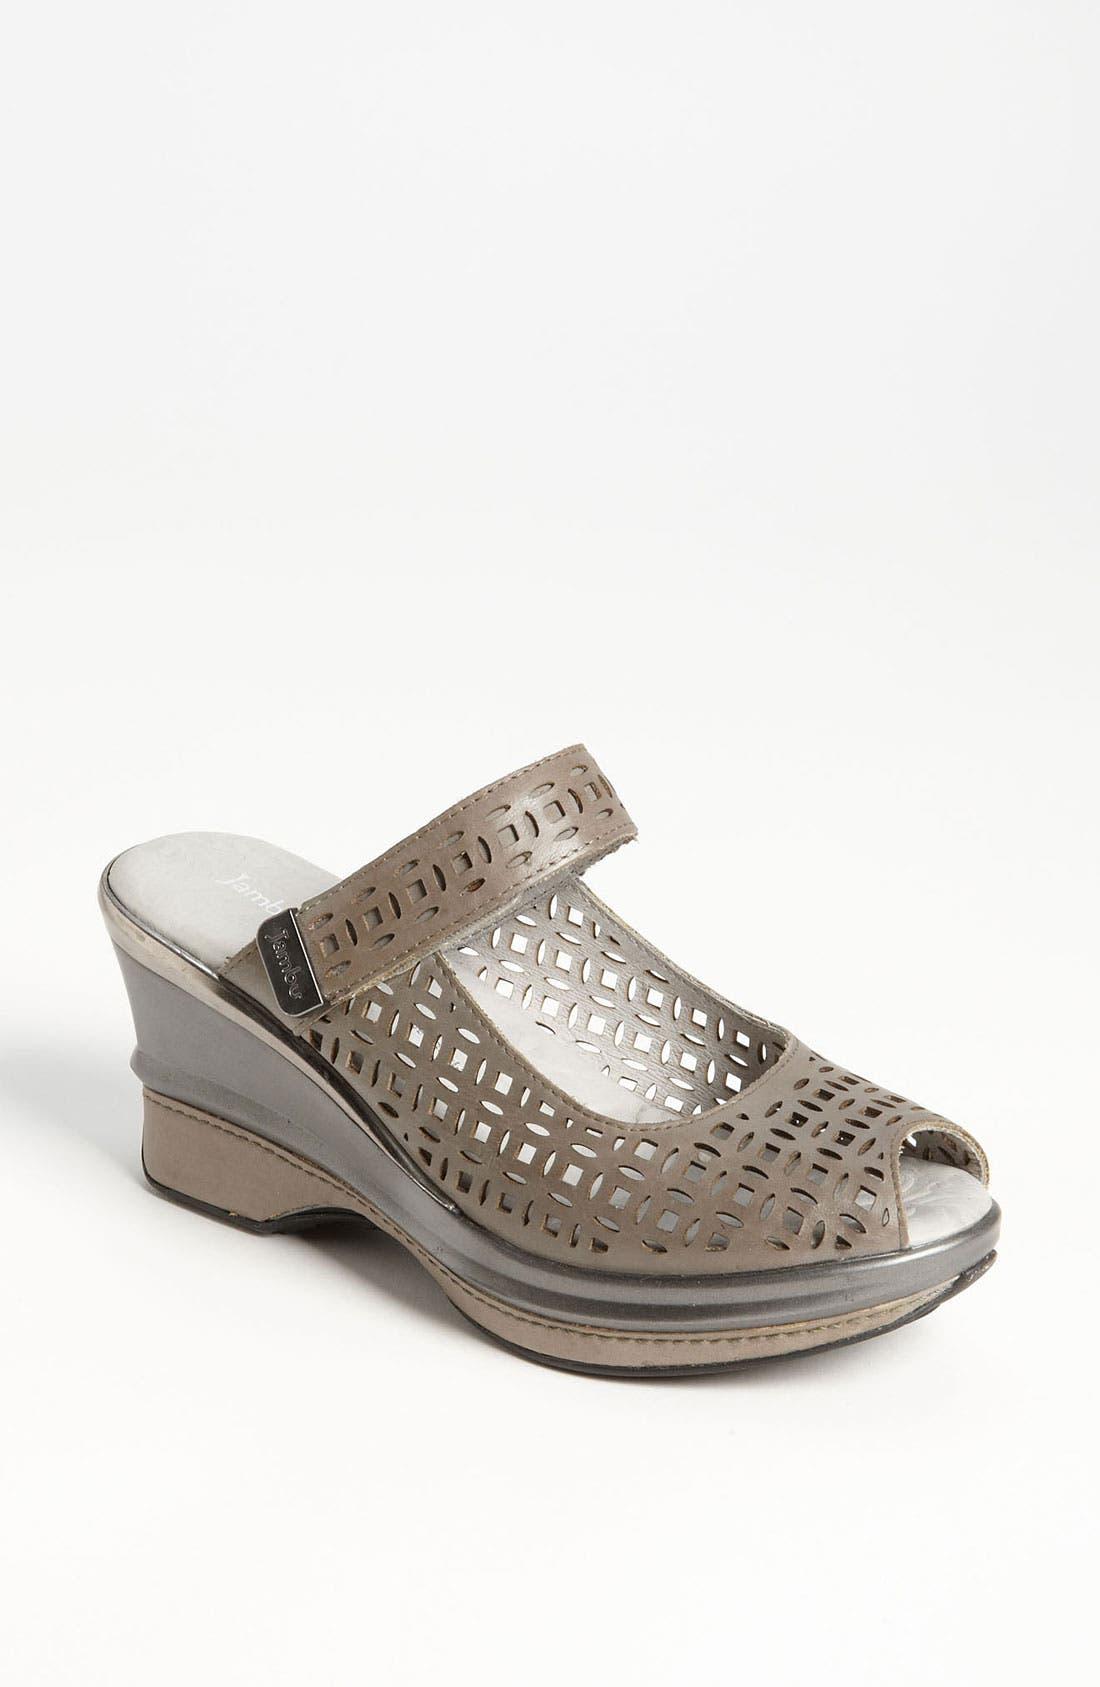 Main Image - Jambu 'Orion' Sandal